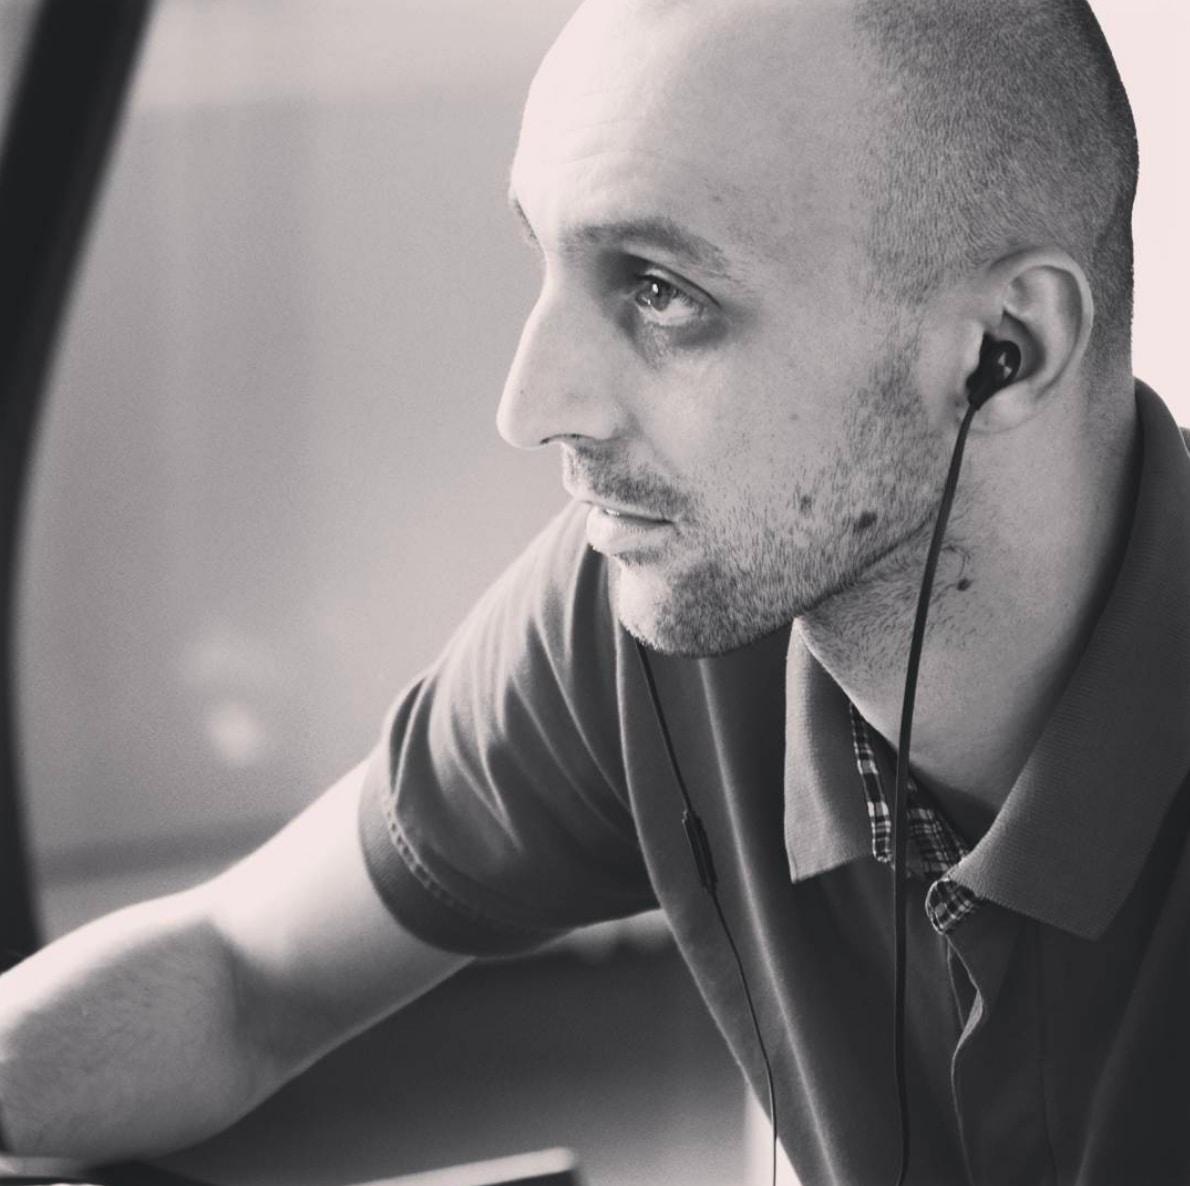 Go to Alexandru Sofronie's profile